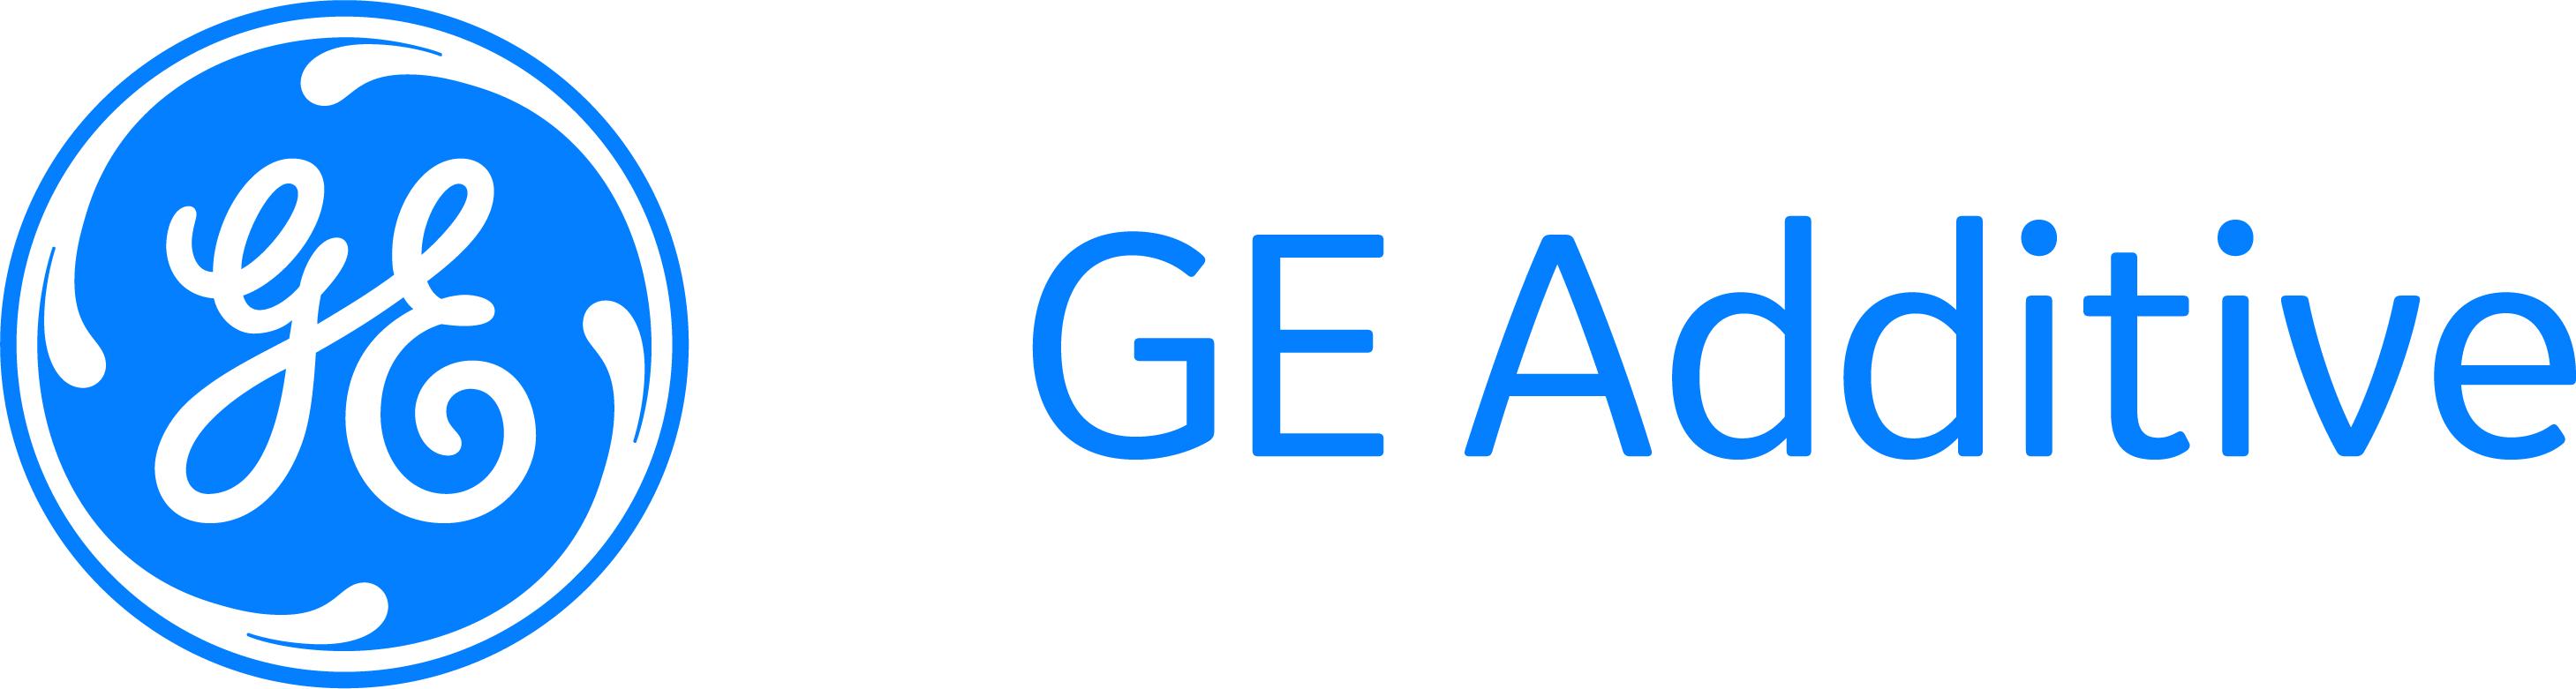 GE Additive